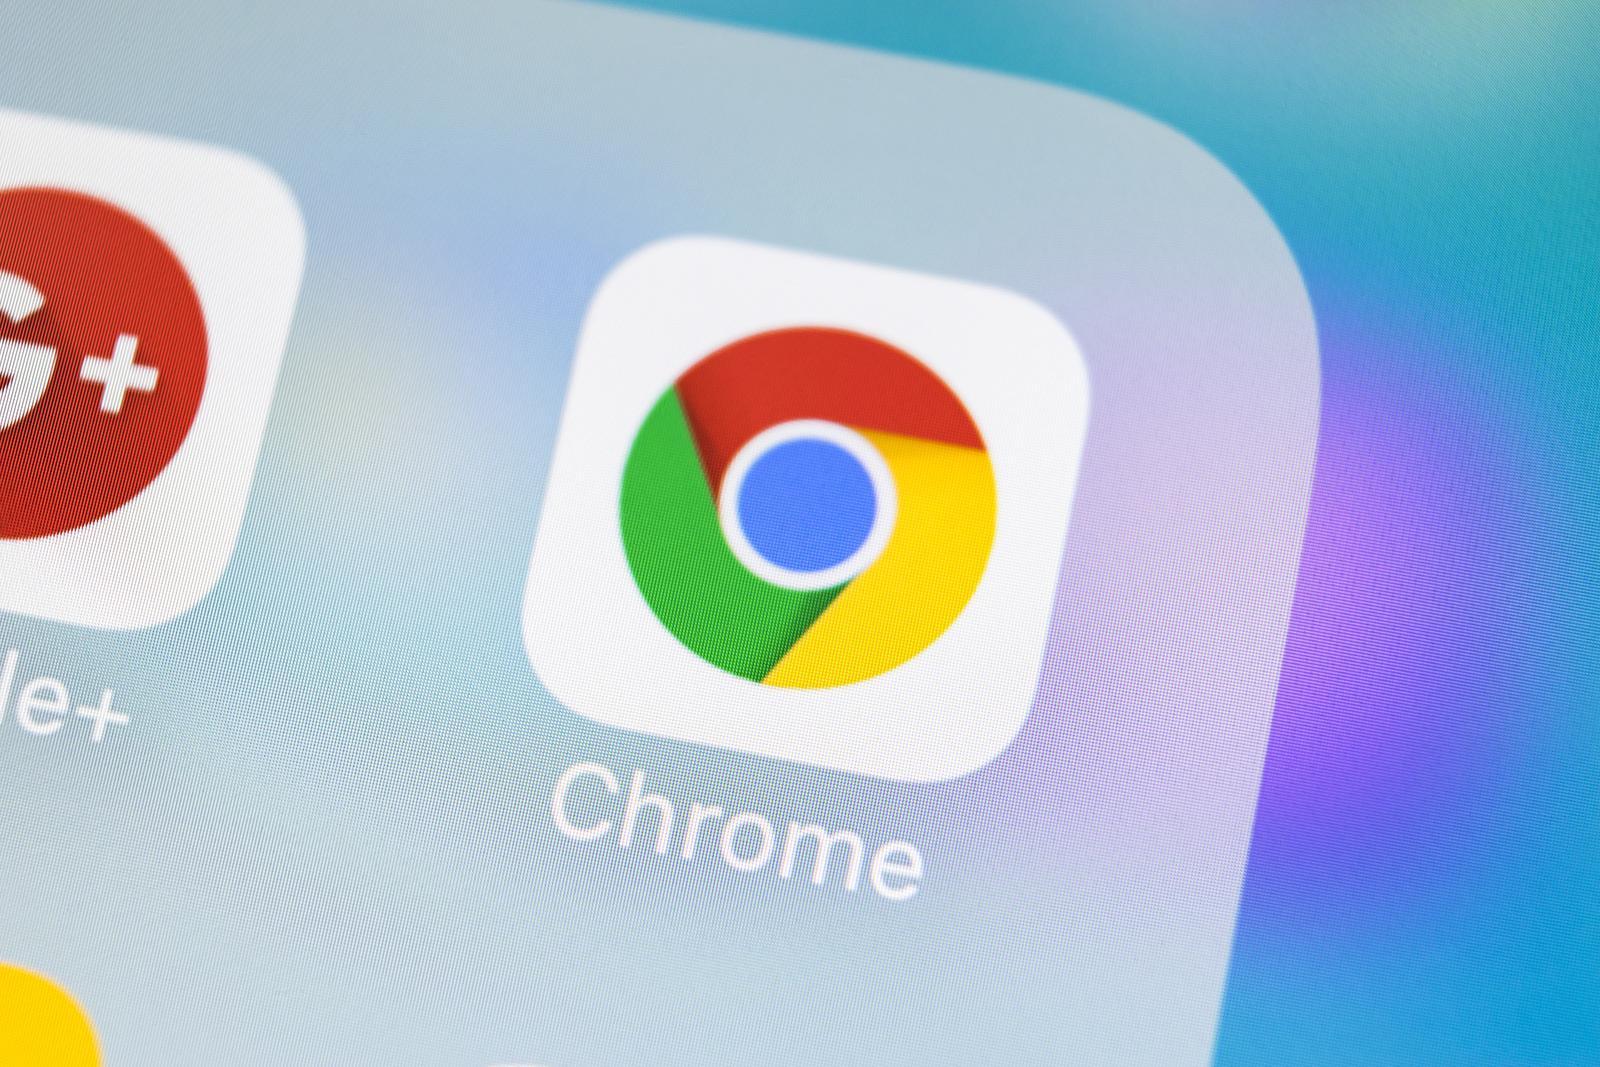 Google Isnt Enforcing Certificate Transparency Until Chrome 68